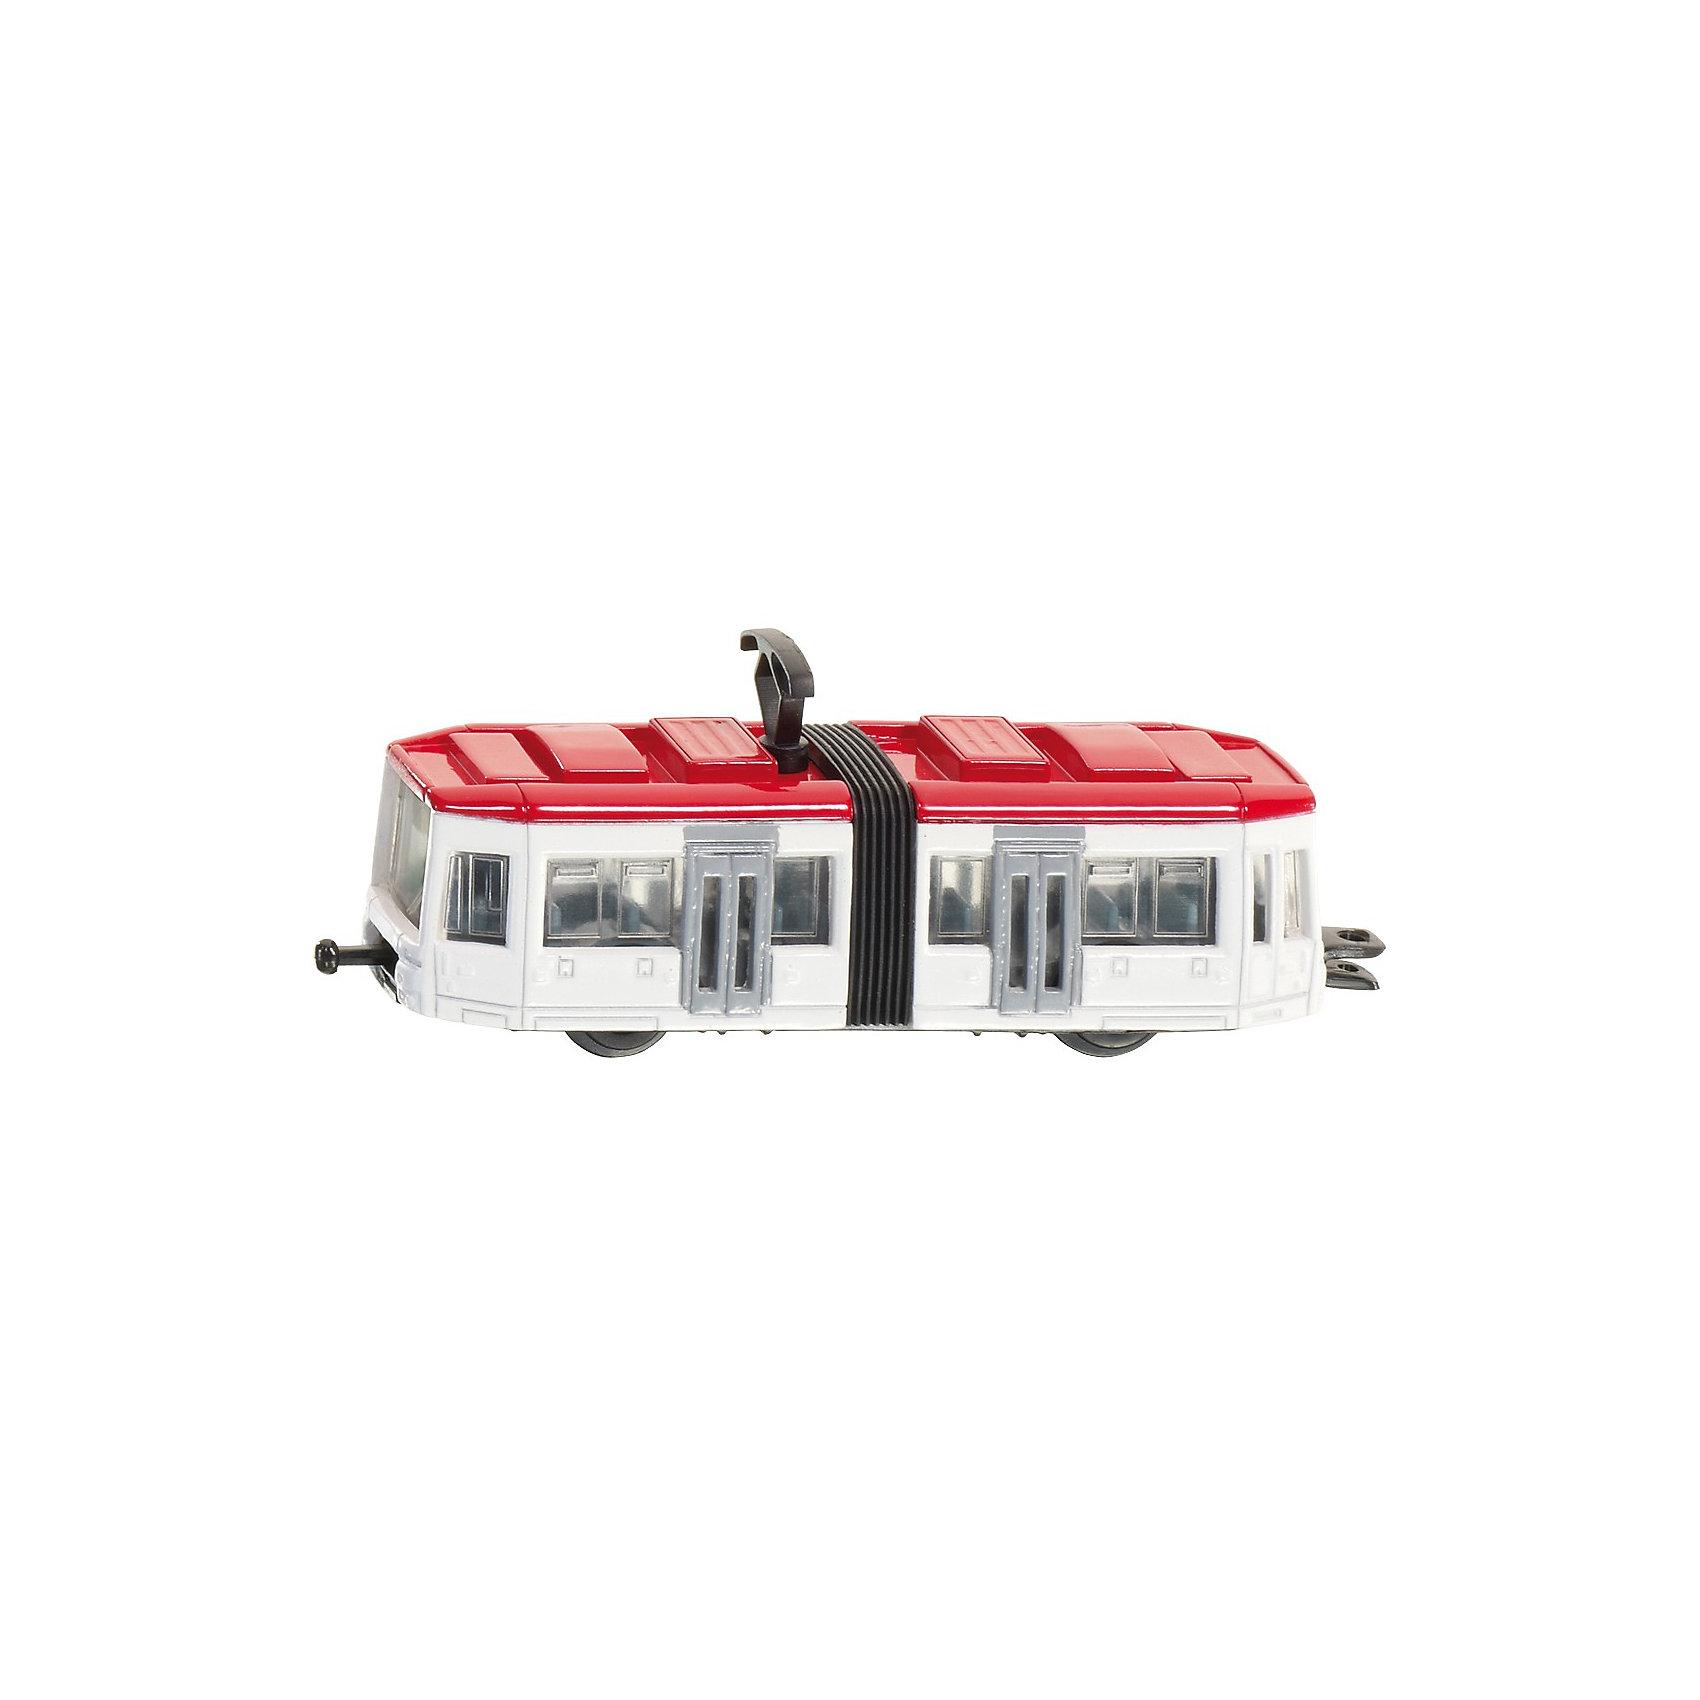 SIKU SIKU 1011 Трамвай конструкторы игрушки из дерева трамвай